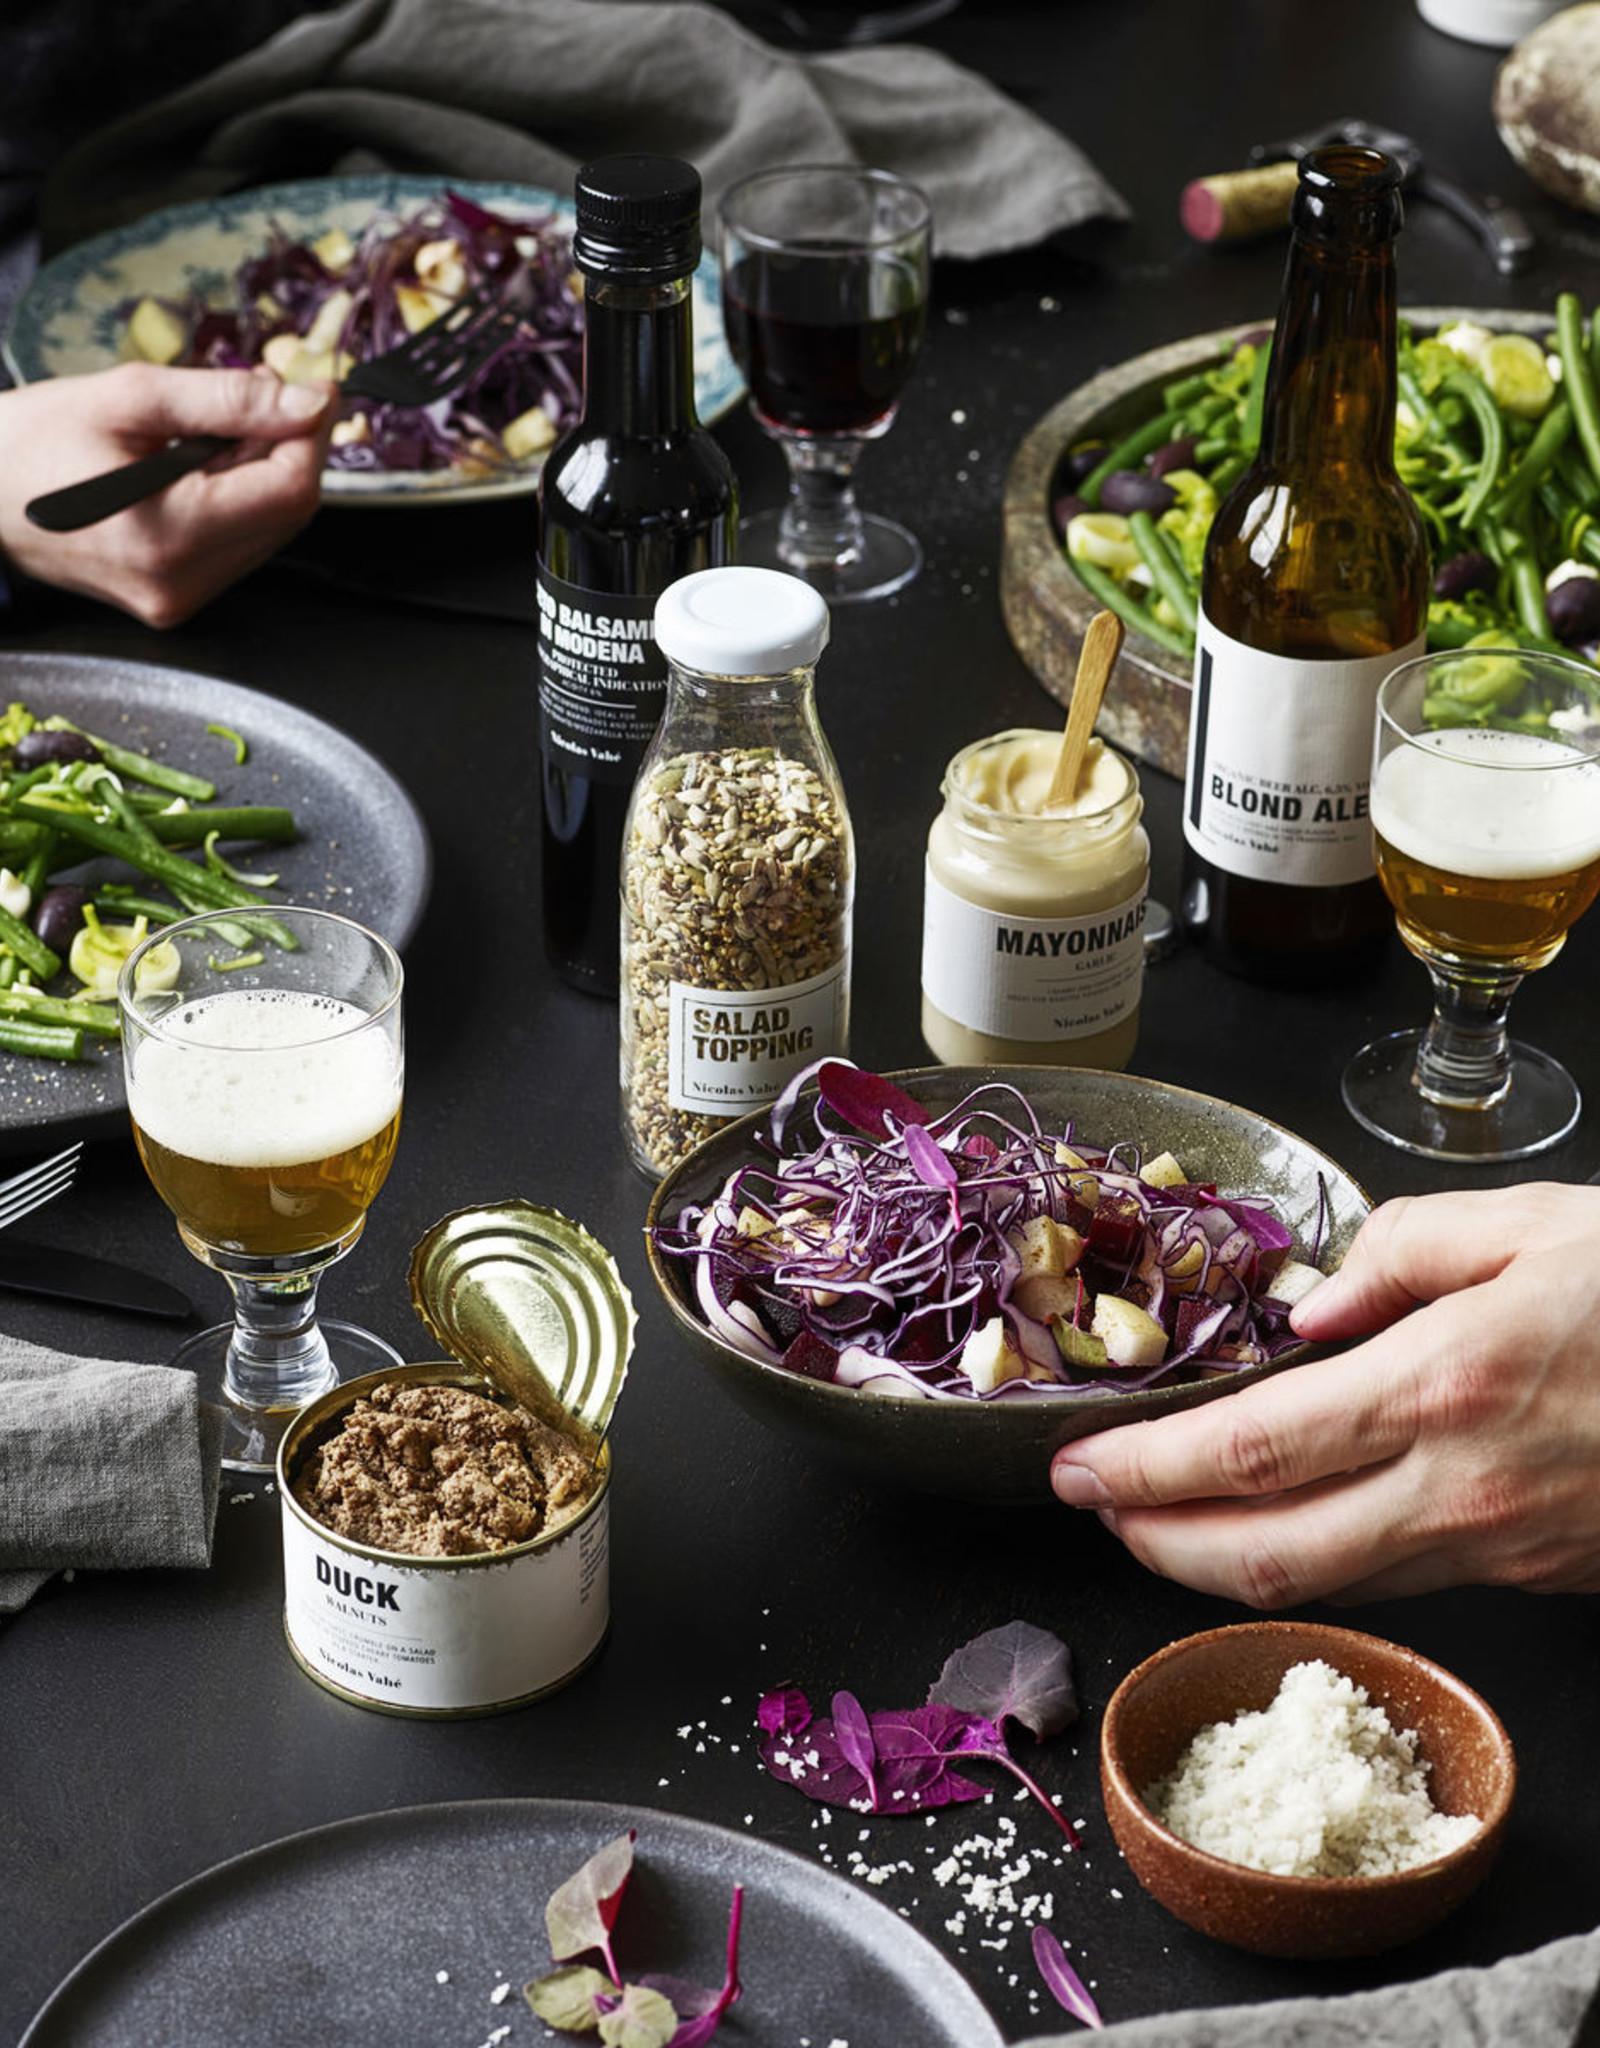 Nicolas Vahe Salad topping mixed seeds